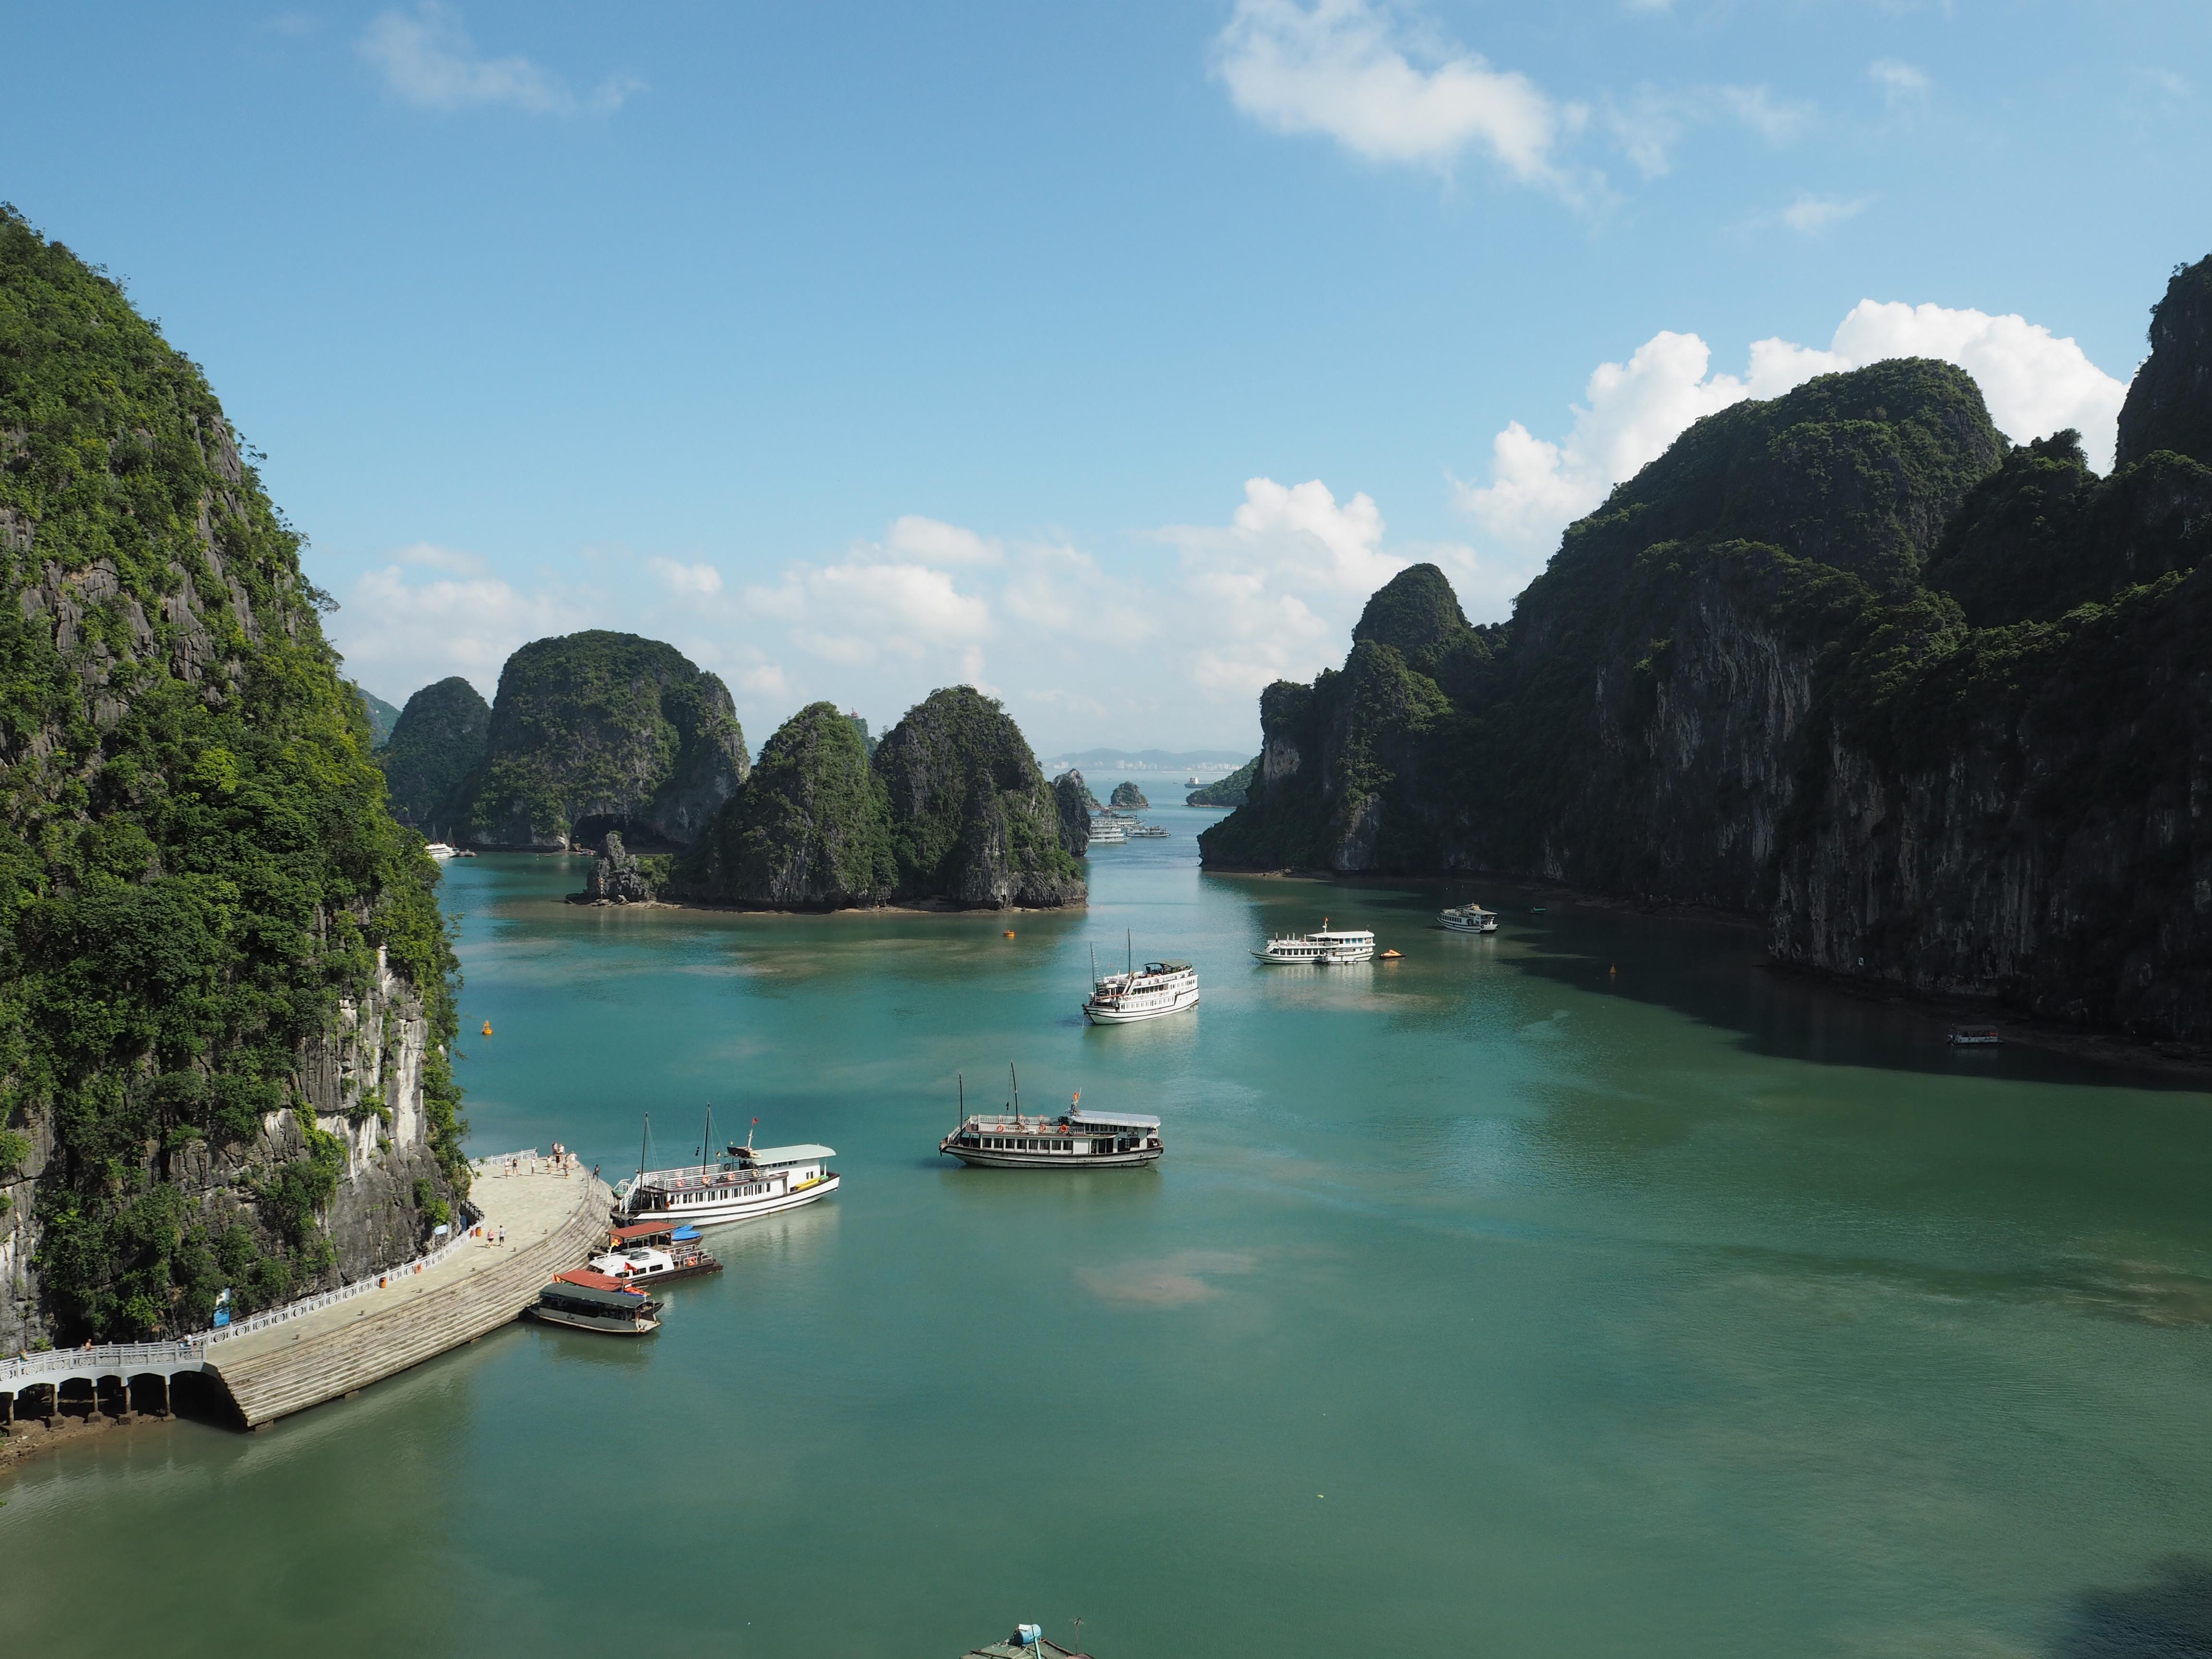 My 3 week Vietnam itinerary - Travel with Trish